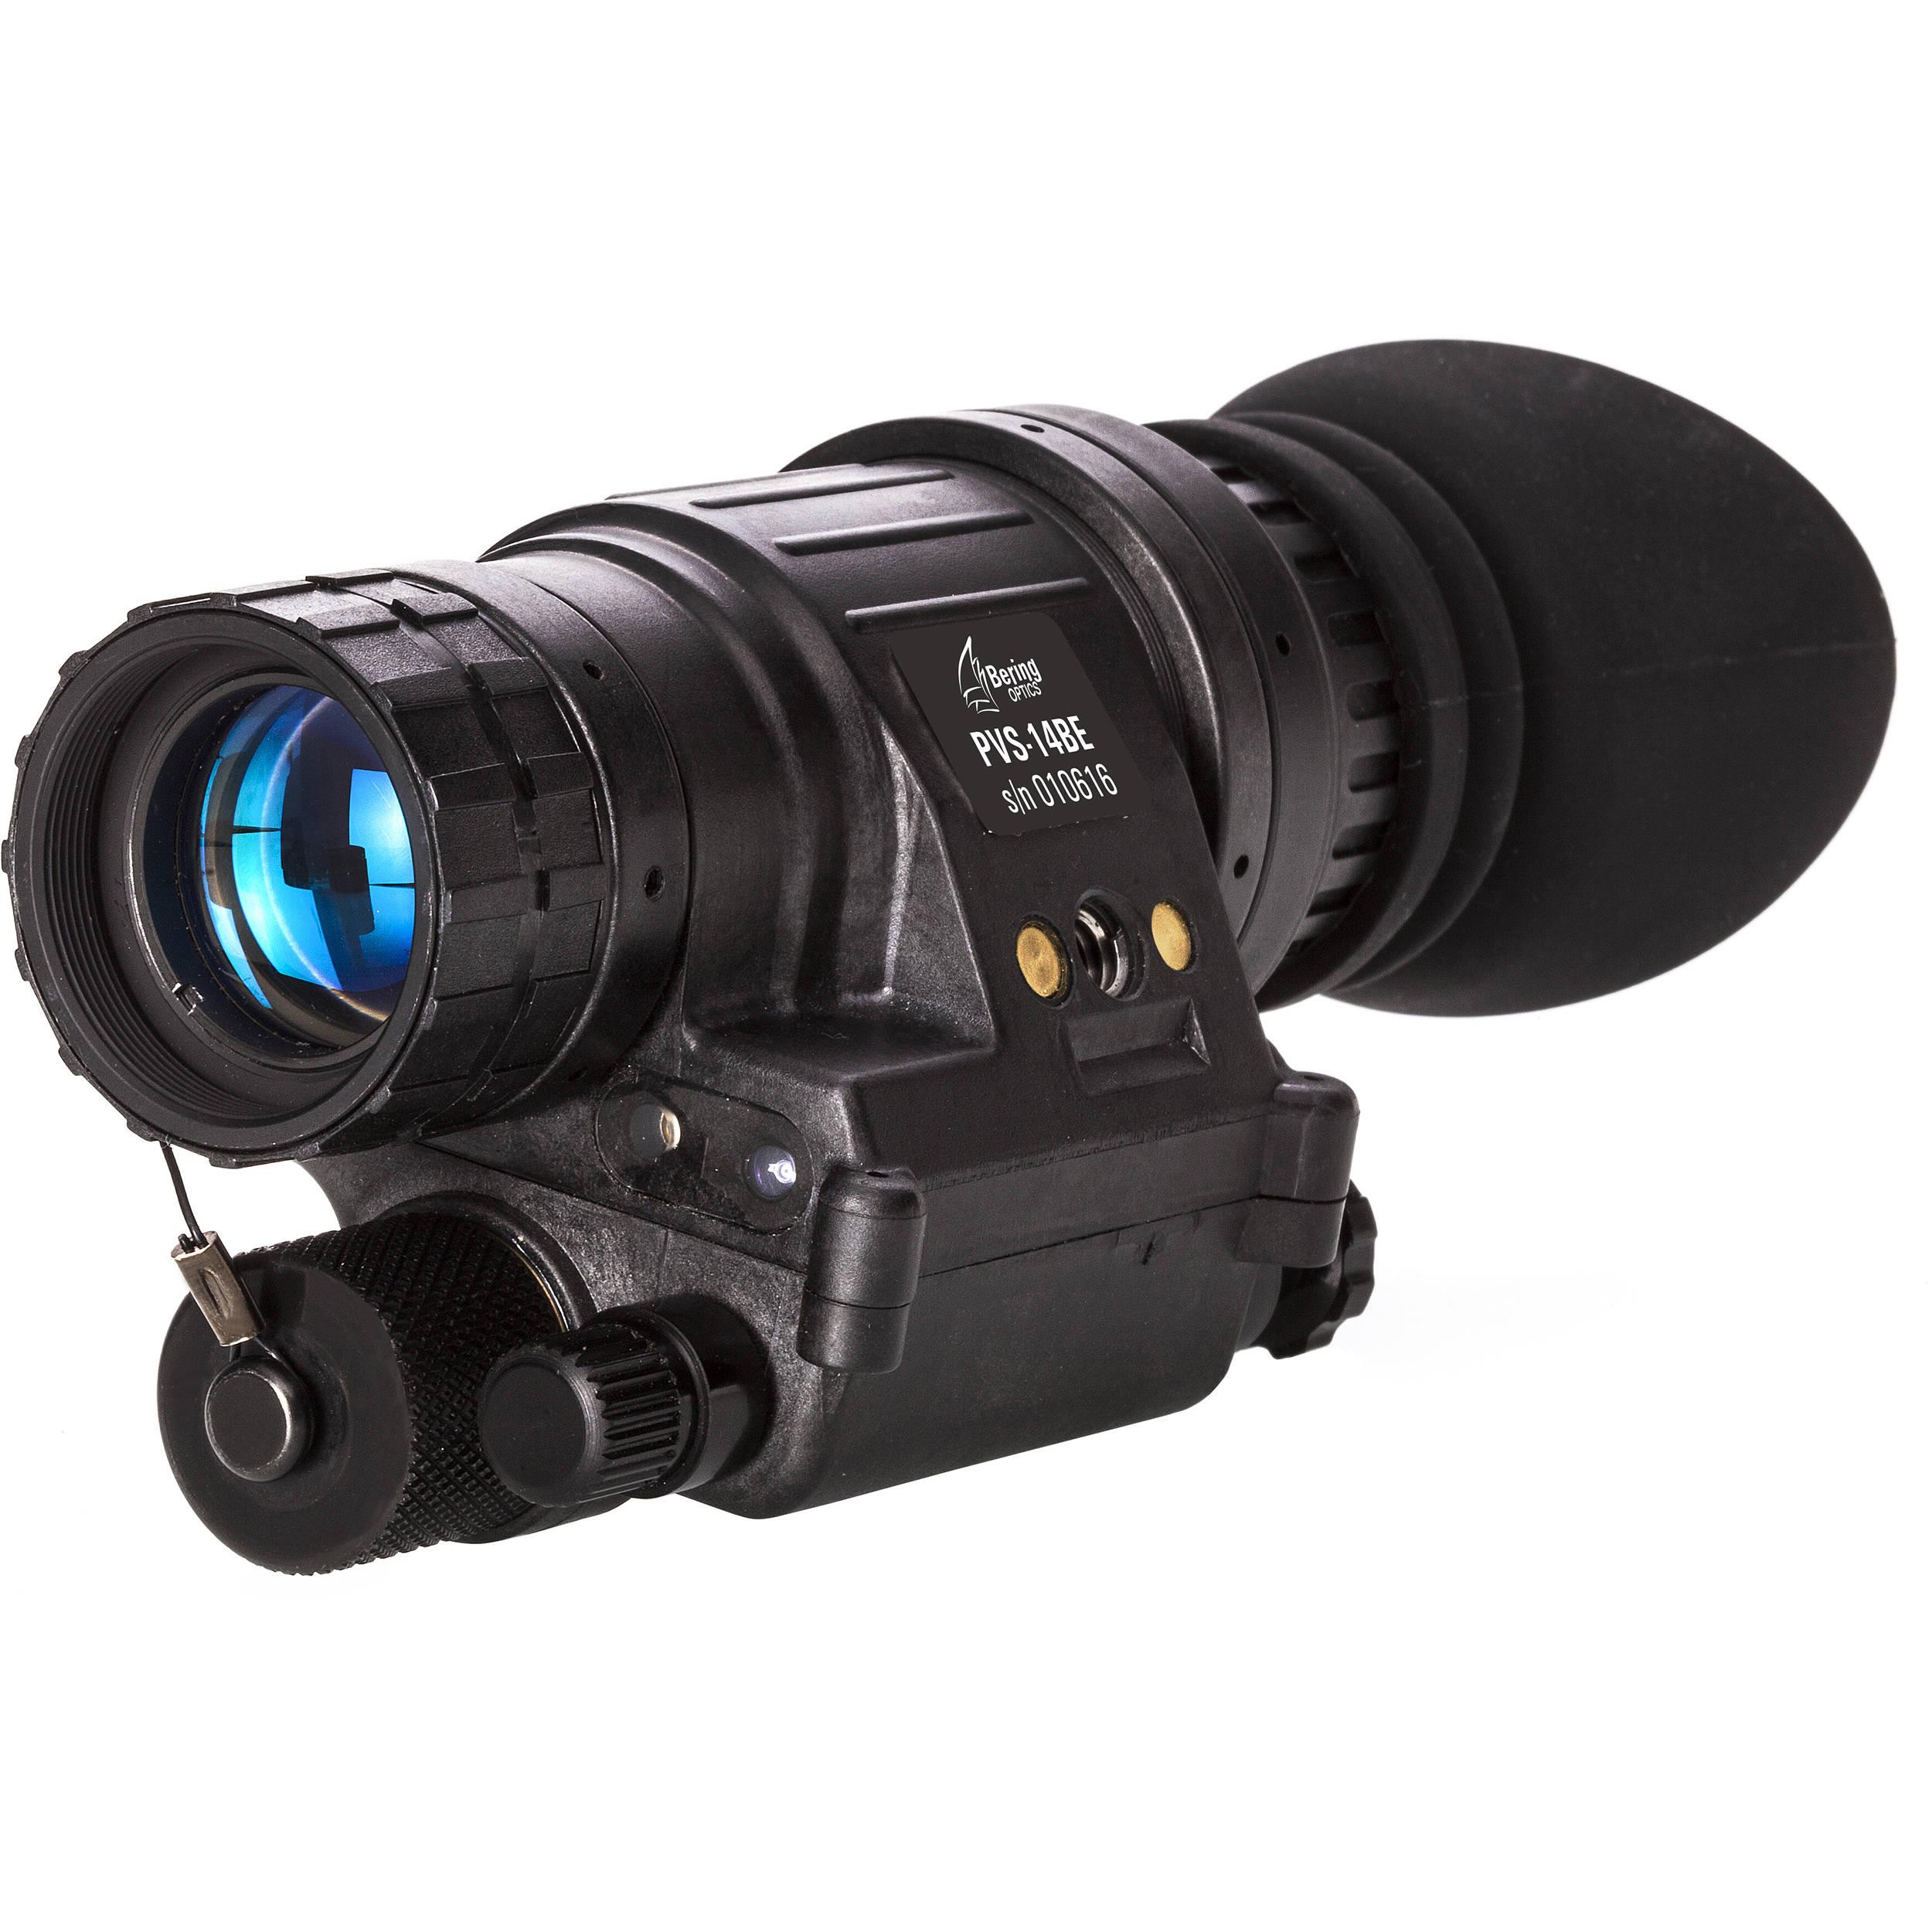 Bering Optics PVS-14BE 1x22 2nd Gen White Phosphor & Manual Gain Night  Vision Monocular